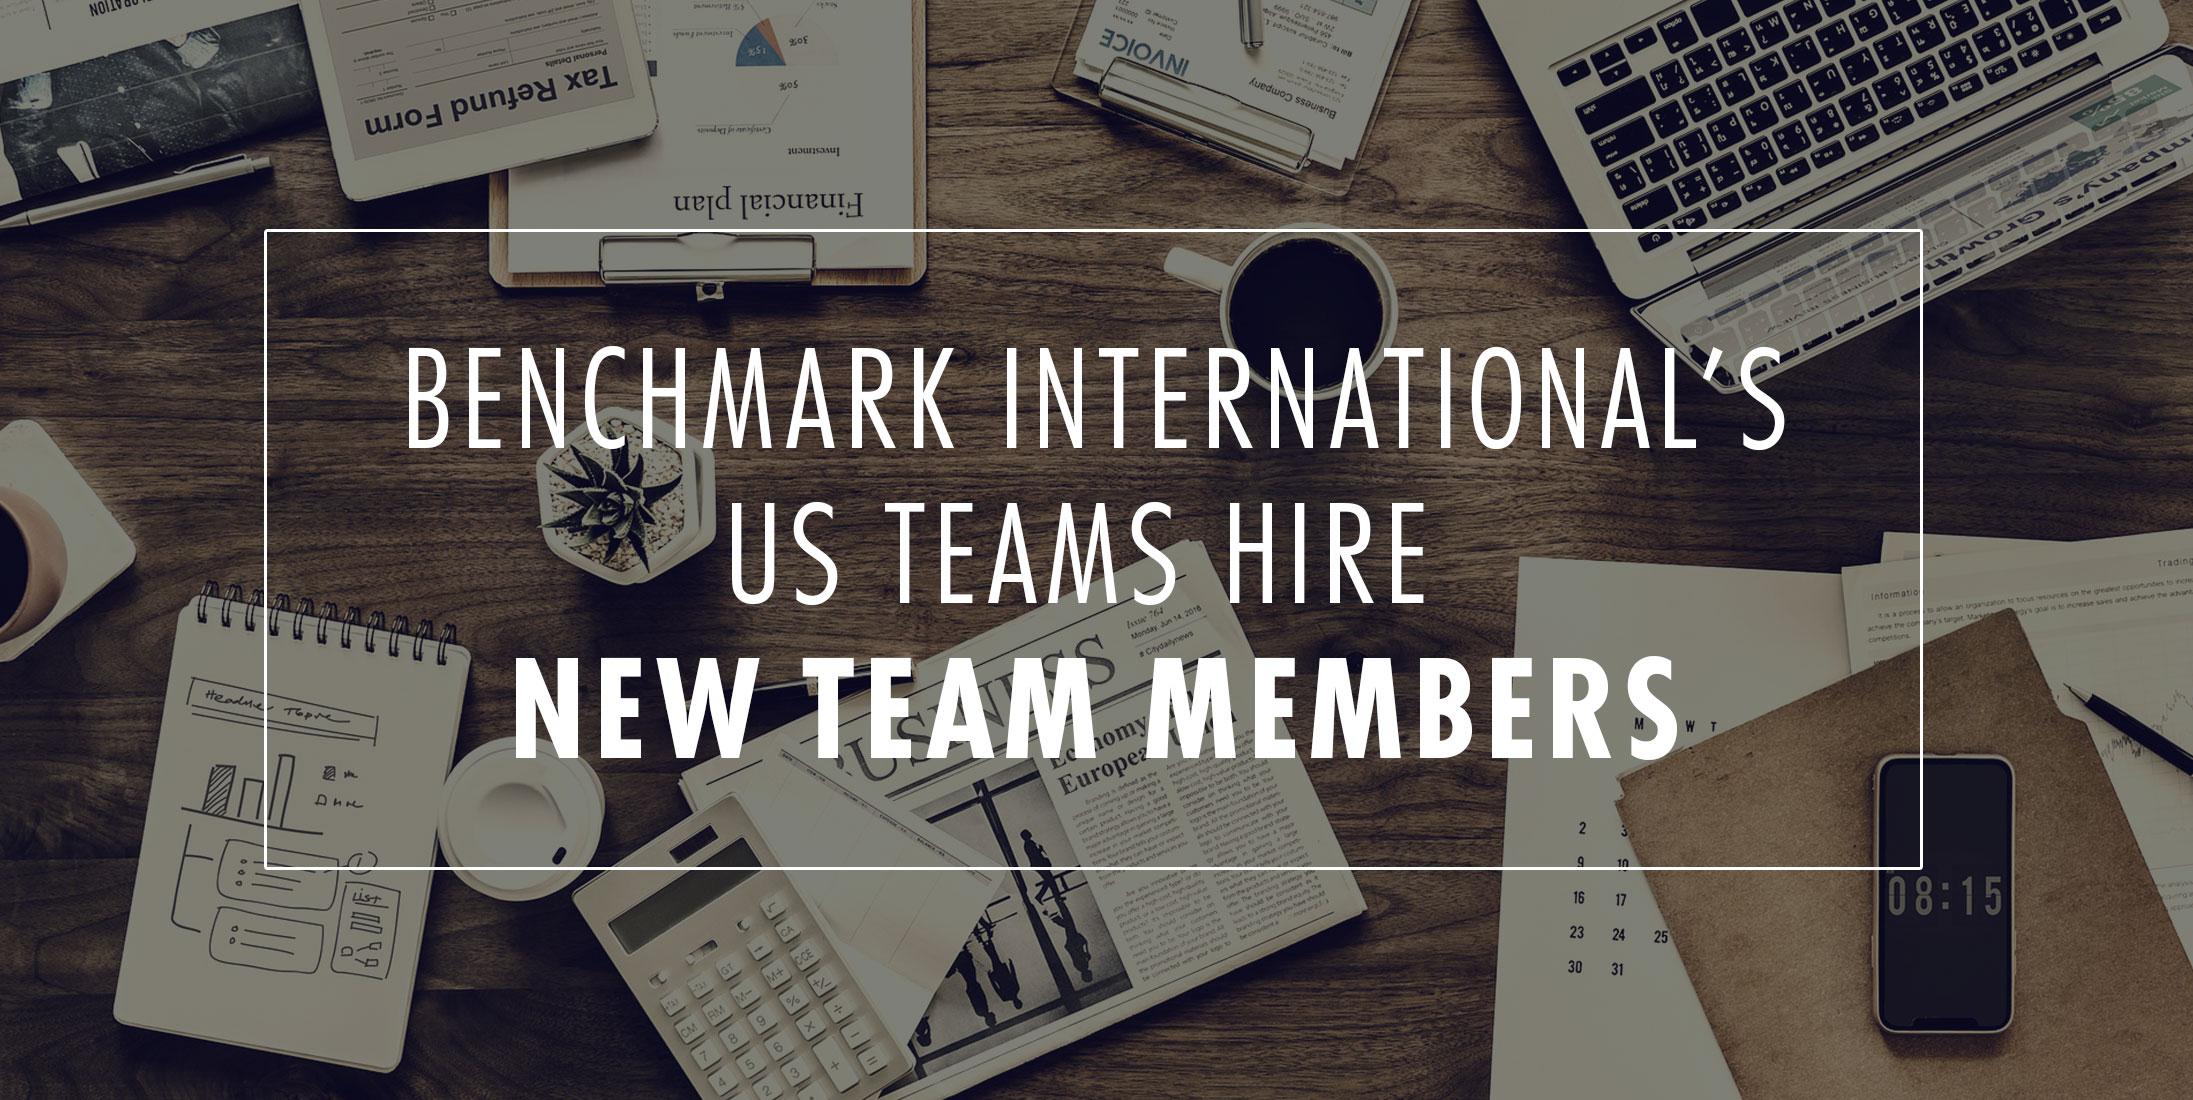 Benchmark International's US Teams Hire New Team Members